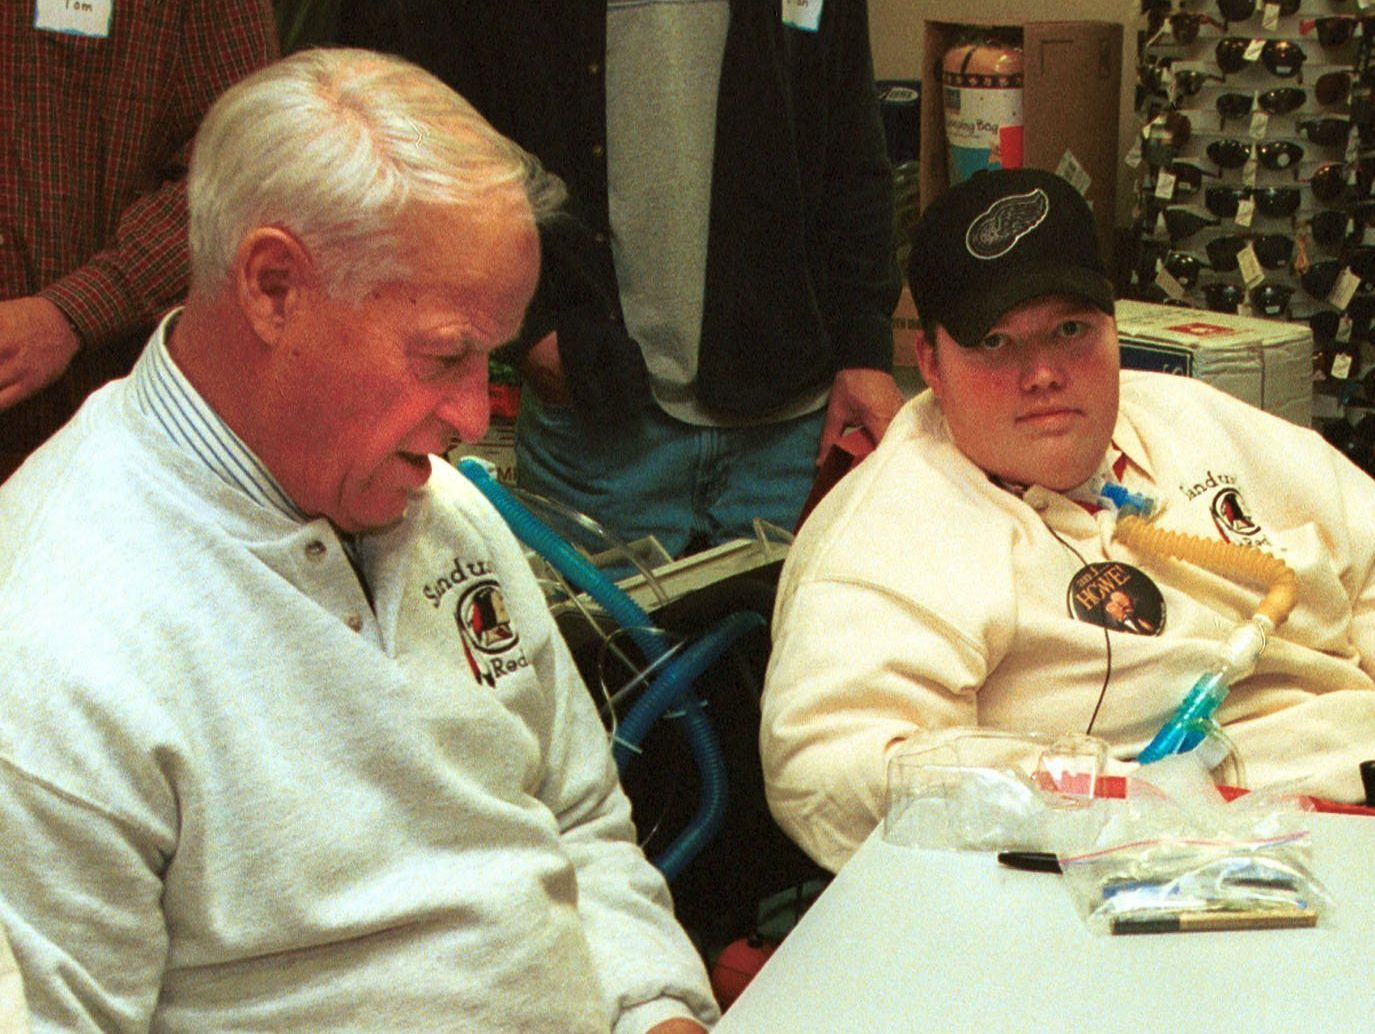 Gordie Howe meets with Sandusky's Steven Kirkpatrick, who battled muscular dystrophy, on December 22, 1999.